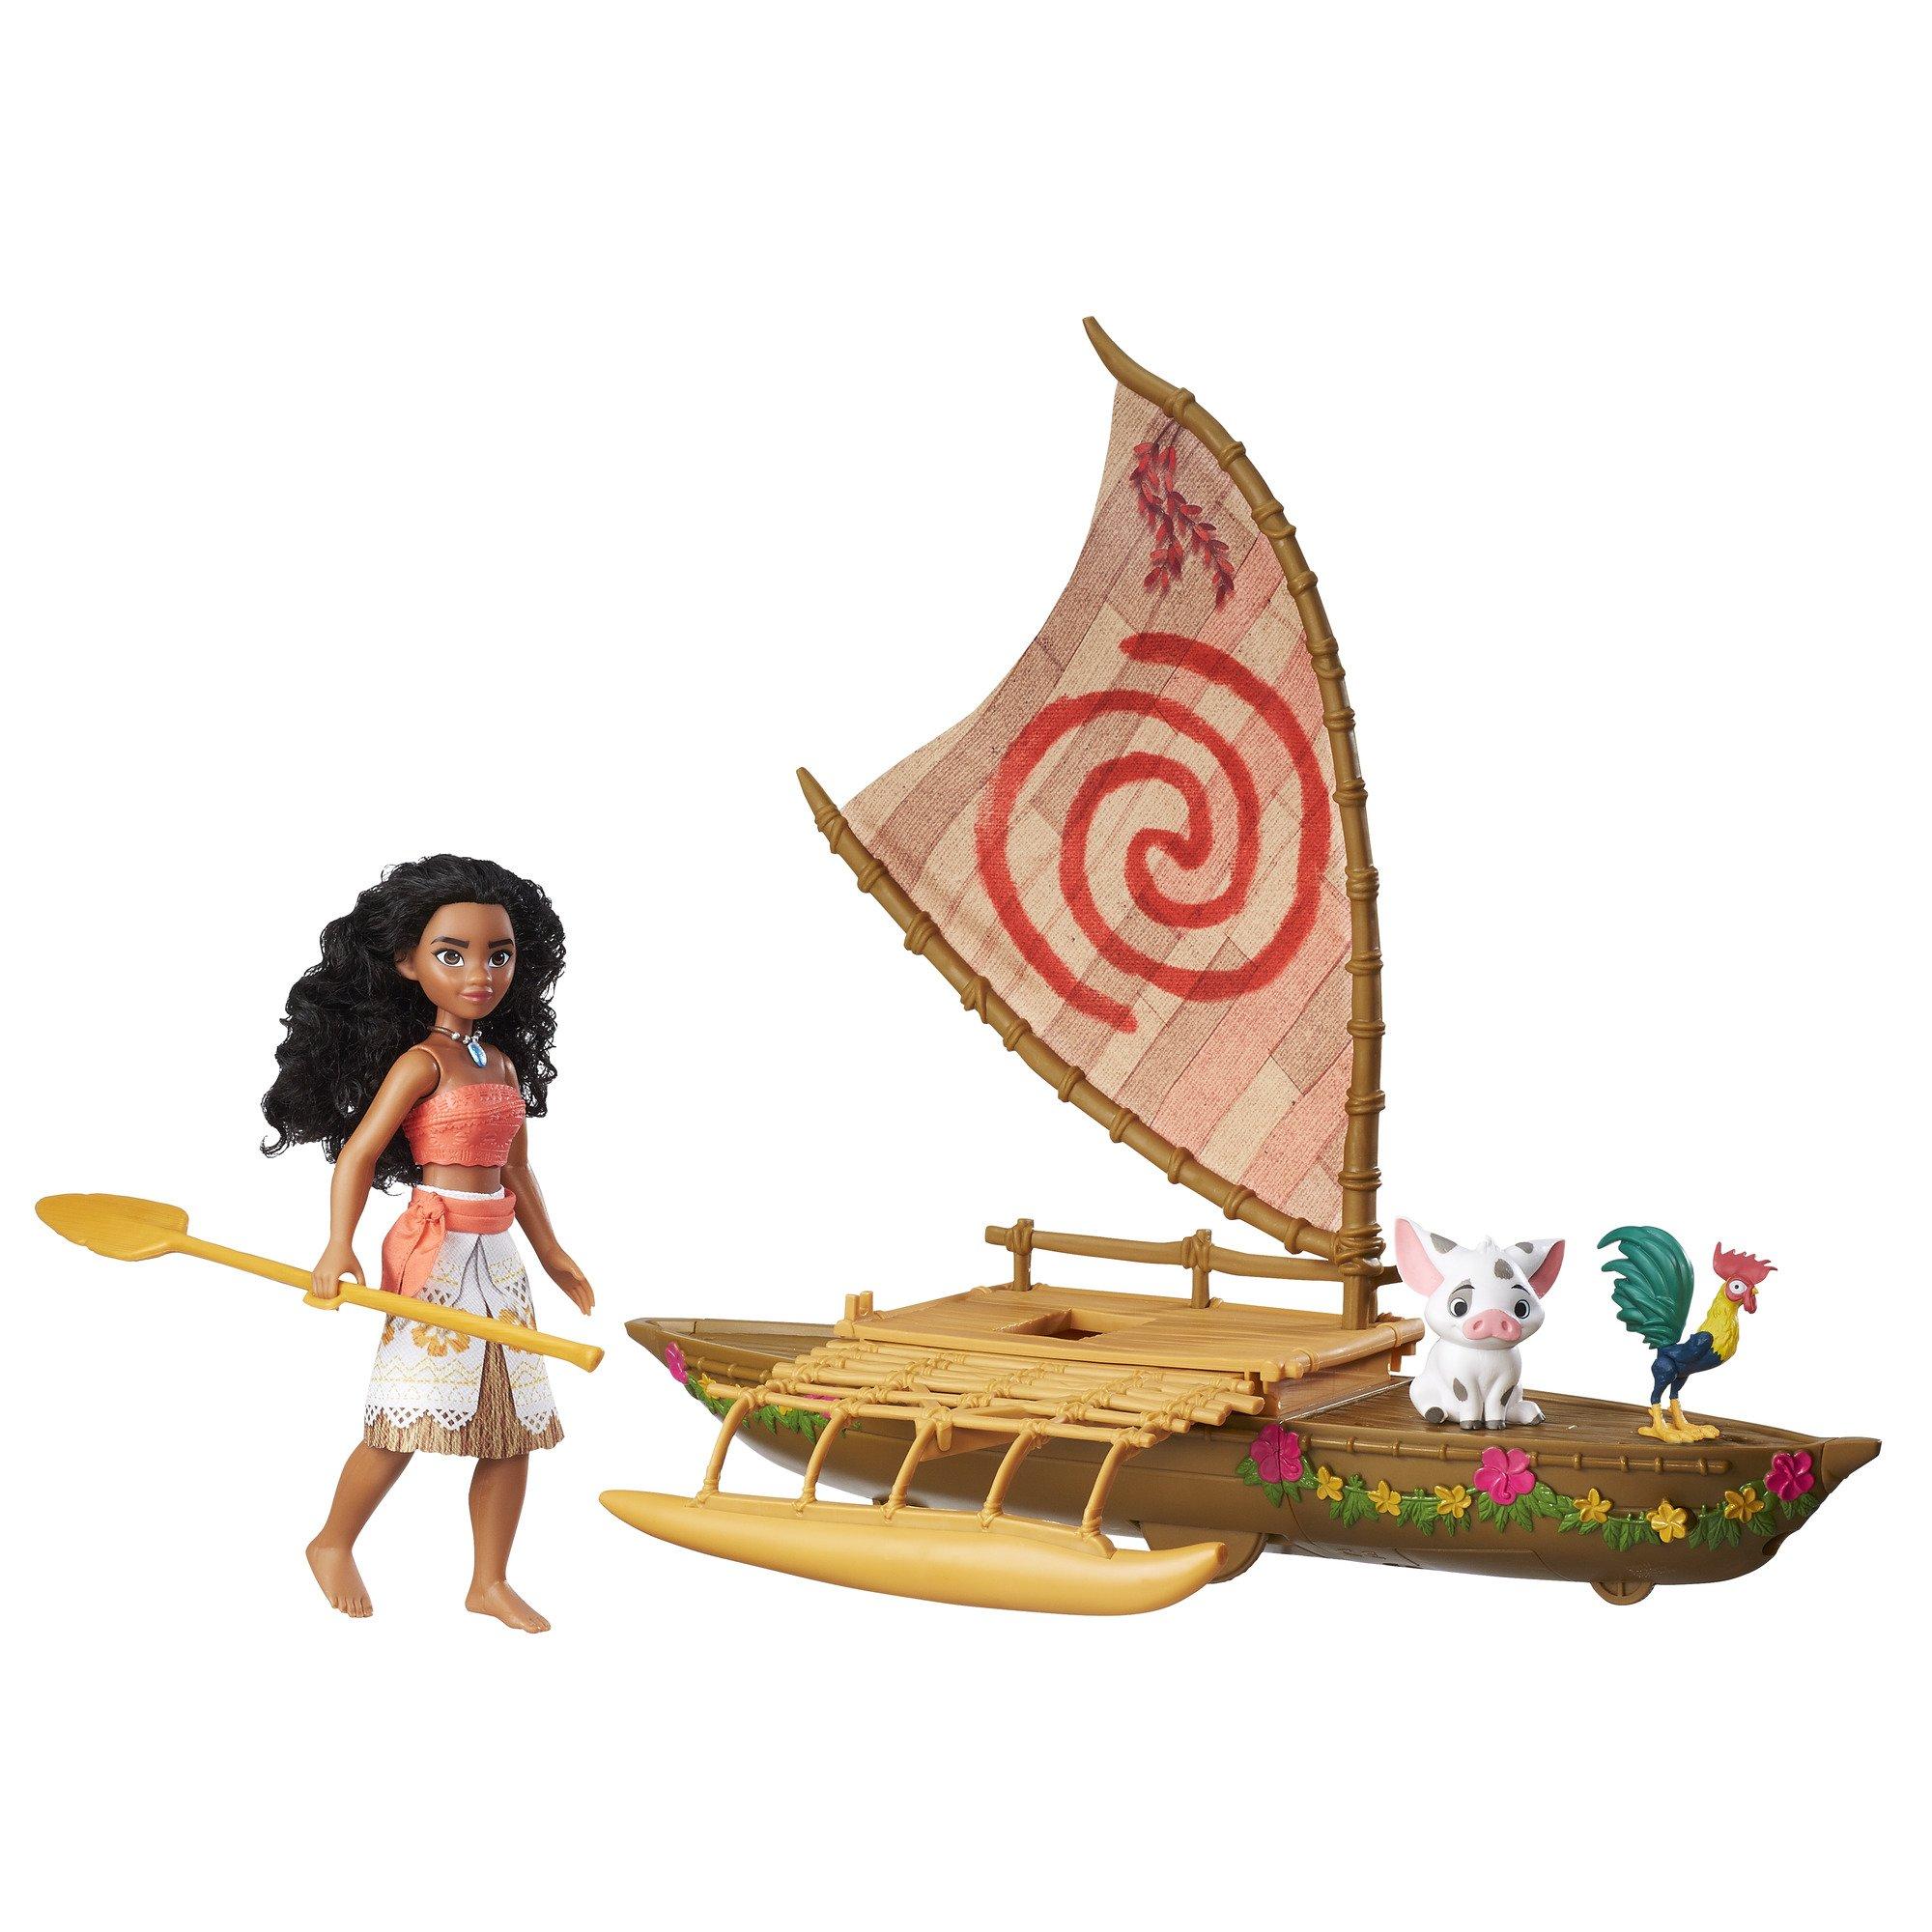 Pua /& Hei Hei Disney Moana Starlight Canoe and Friends Brand New in Box